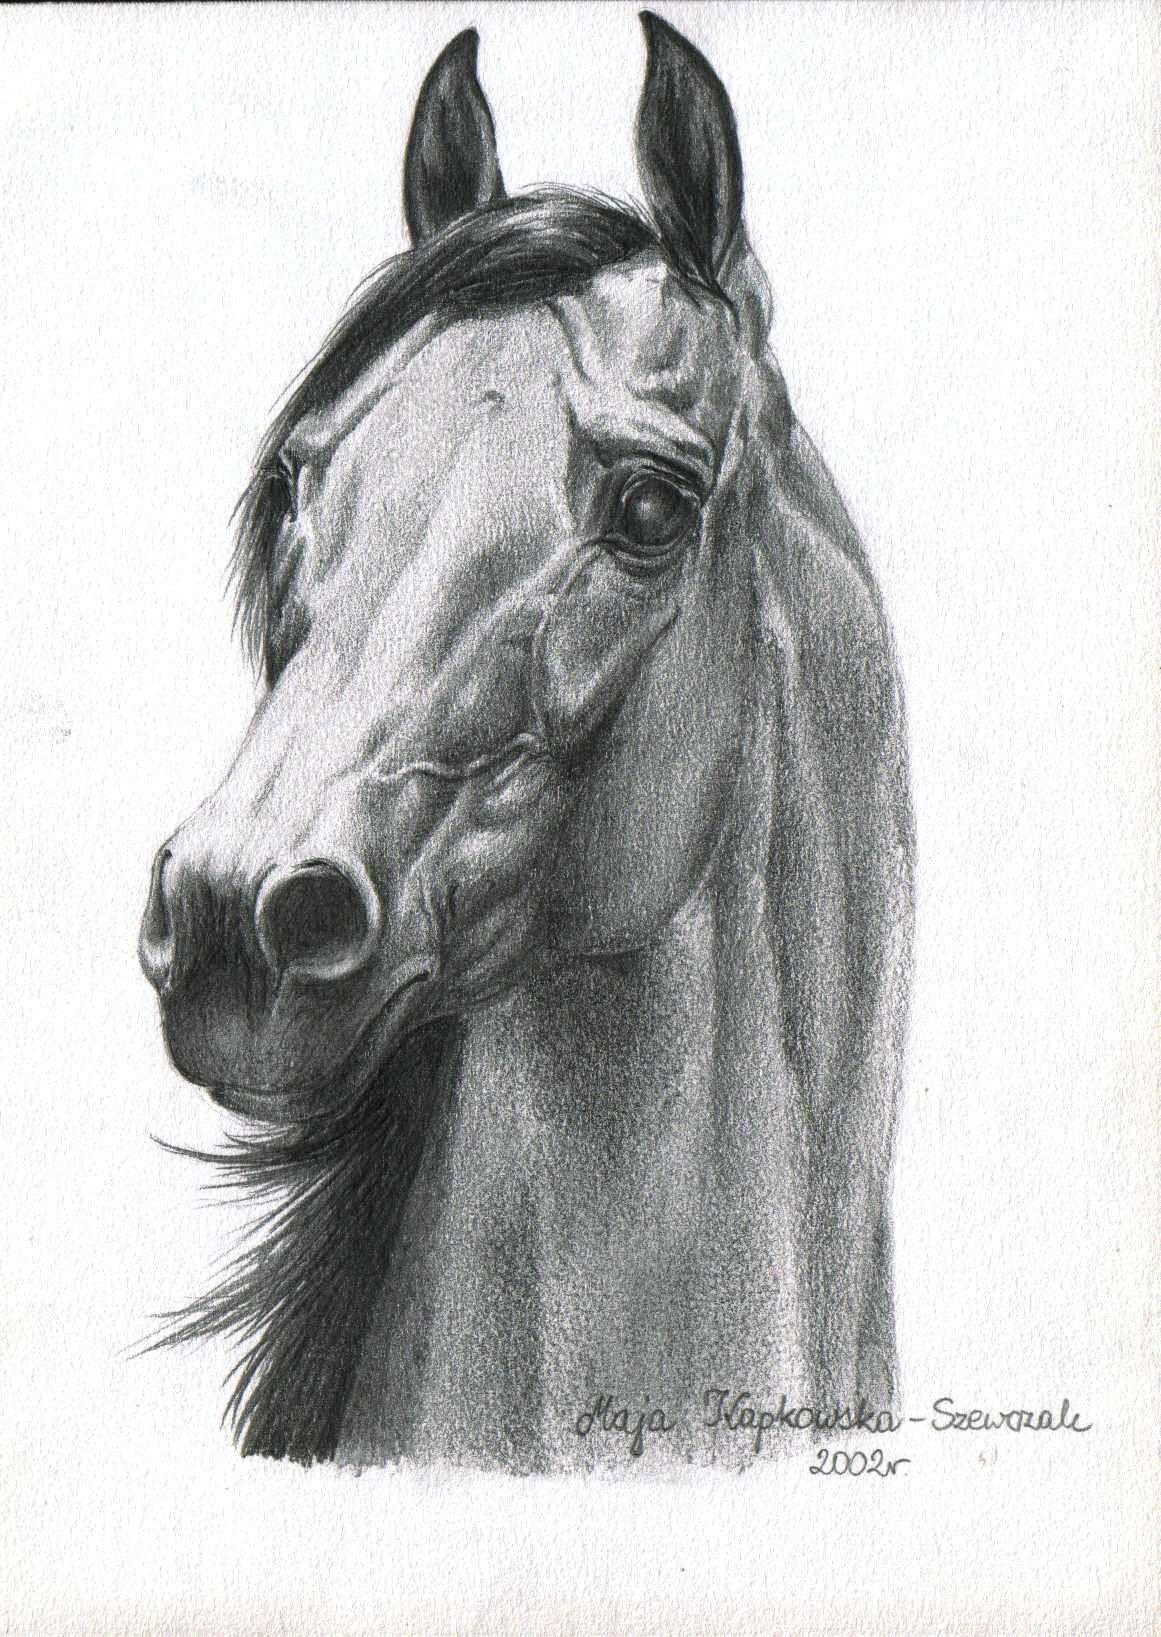 Pencil Arabian Horse Art - Dibujos De Caballos Arte Del Caballo